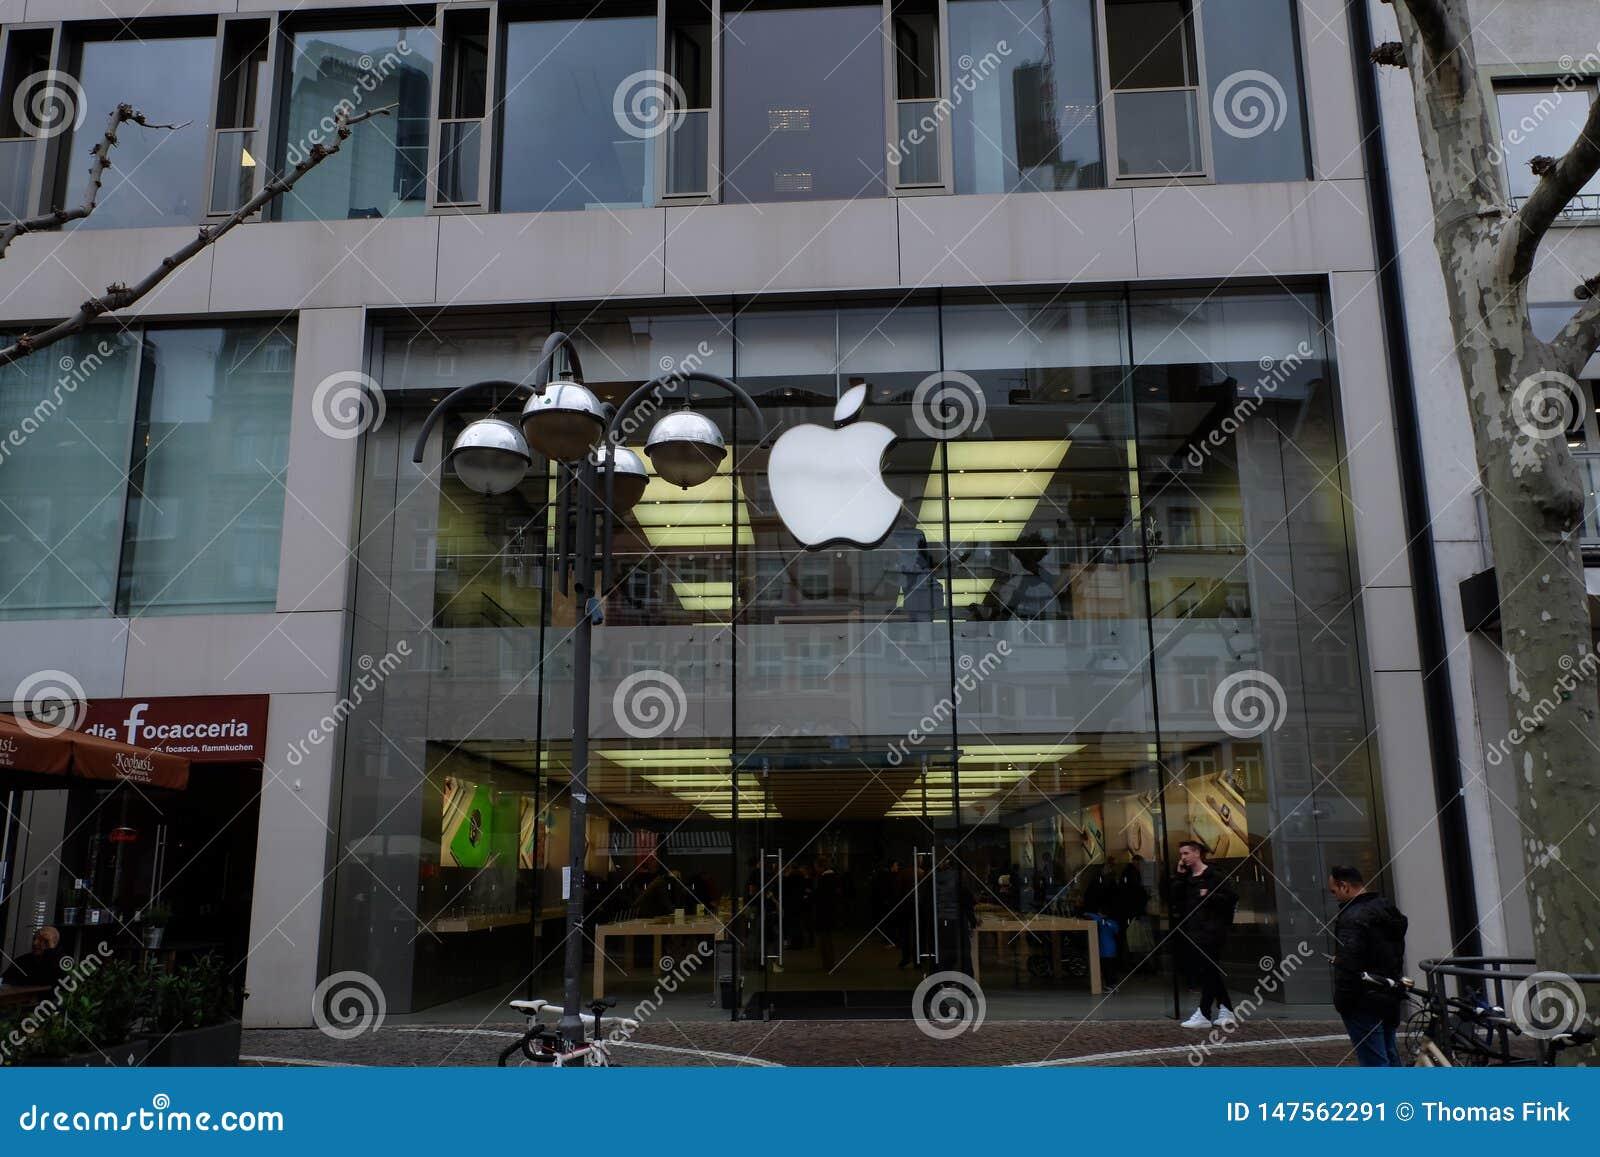 Apple Store Front View in Frankfurt